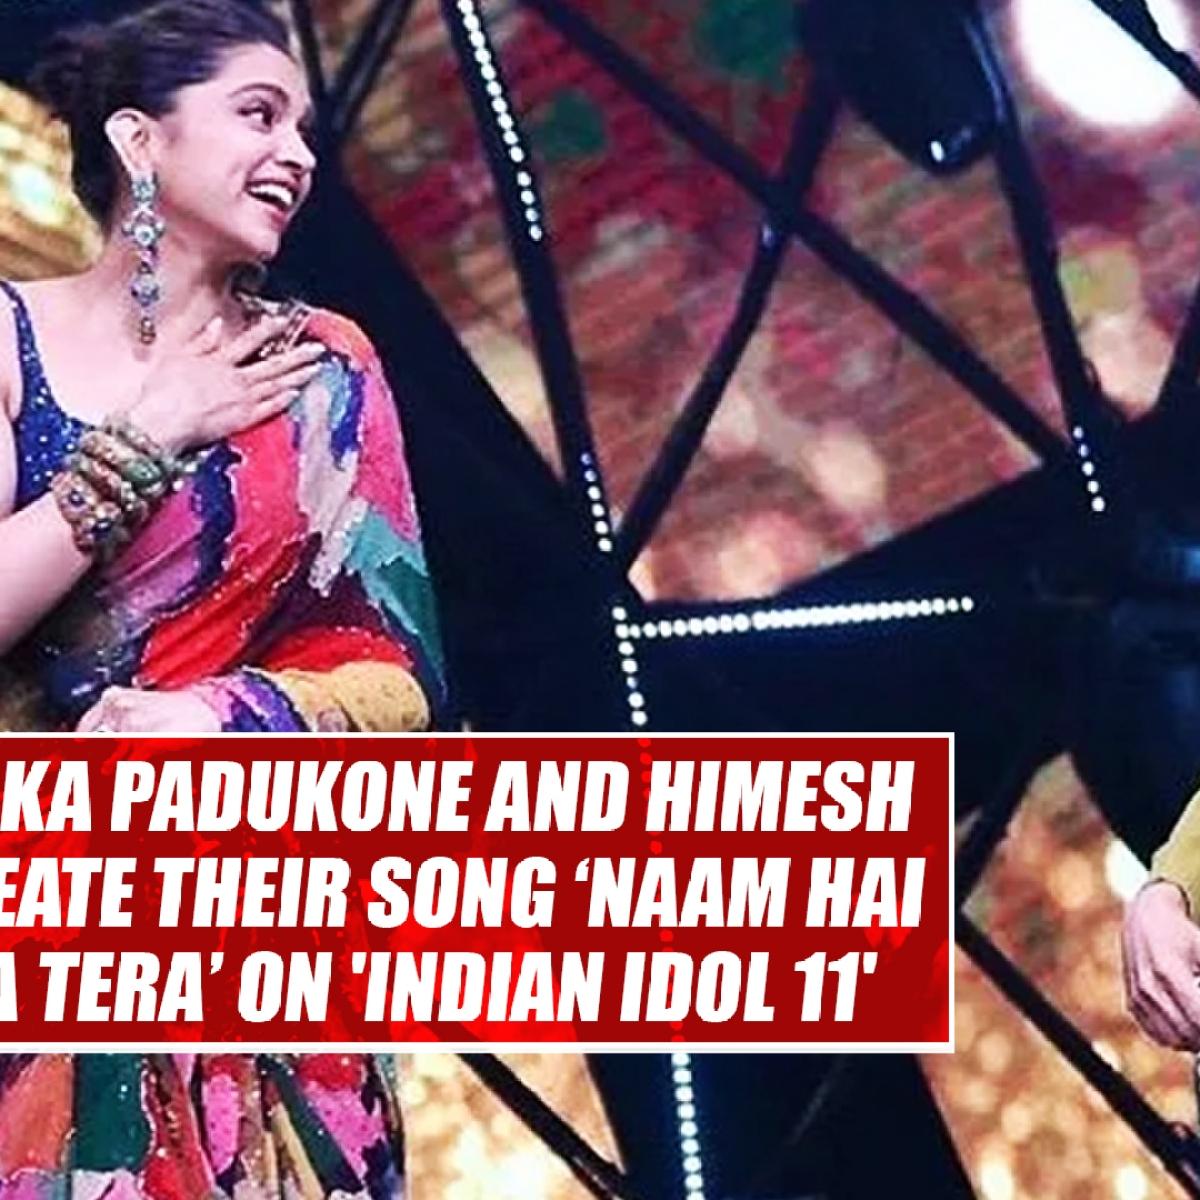 Deepika Padukone and Himesh Reshammiya recreate their song 'Naam Hai Tera Tera' on 'Indian Idol 11'